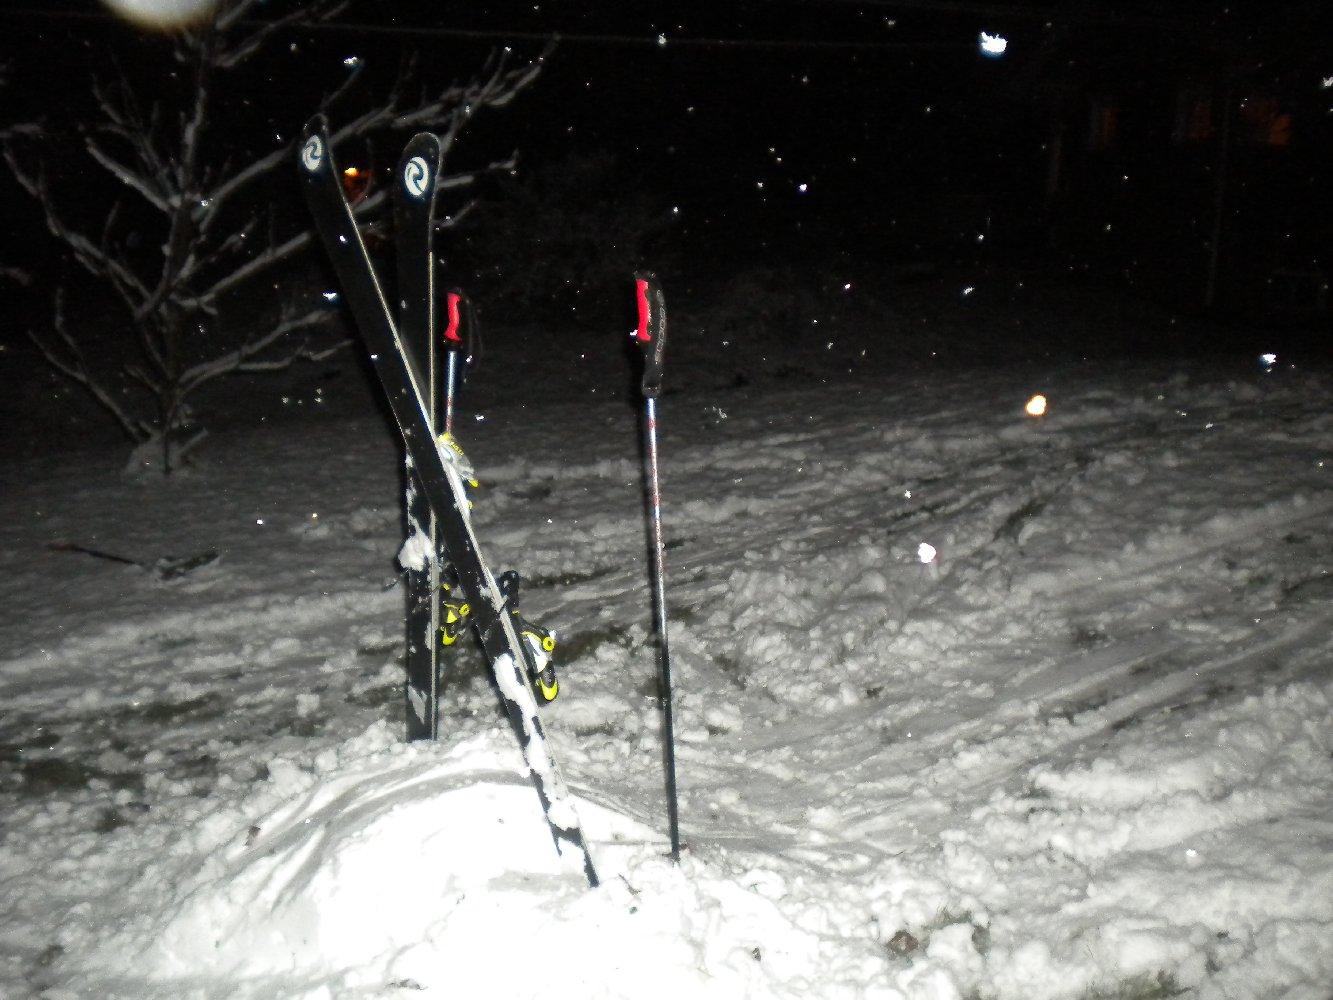 Backyard Skiing on April 18th - 27 of 27